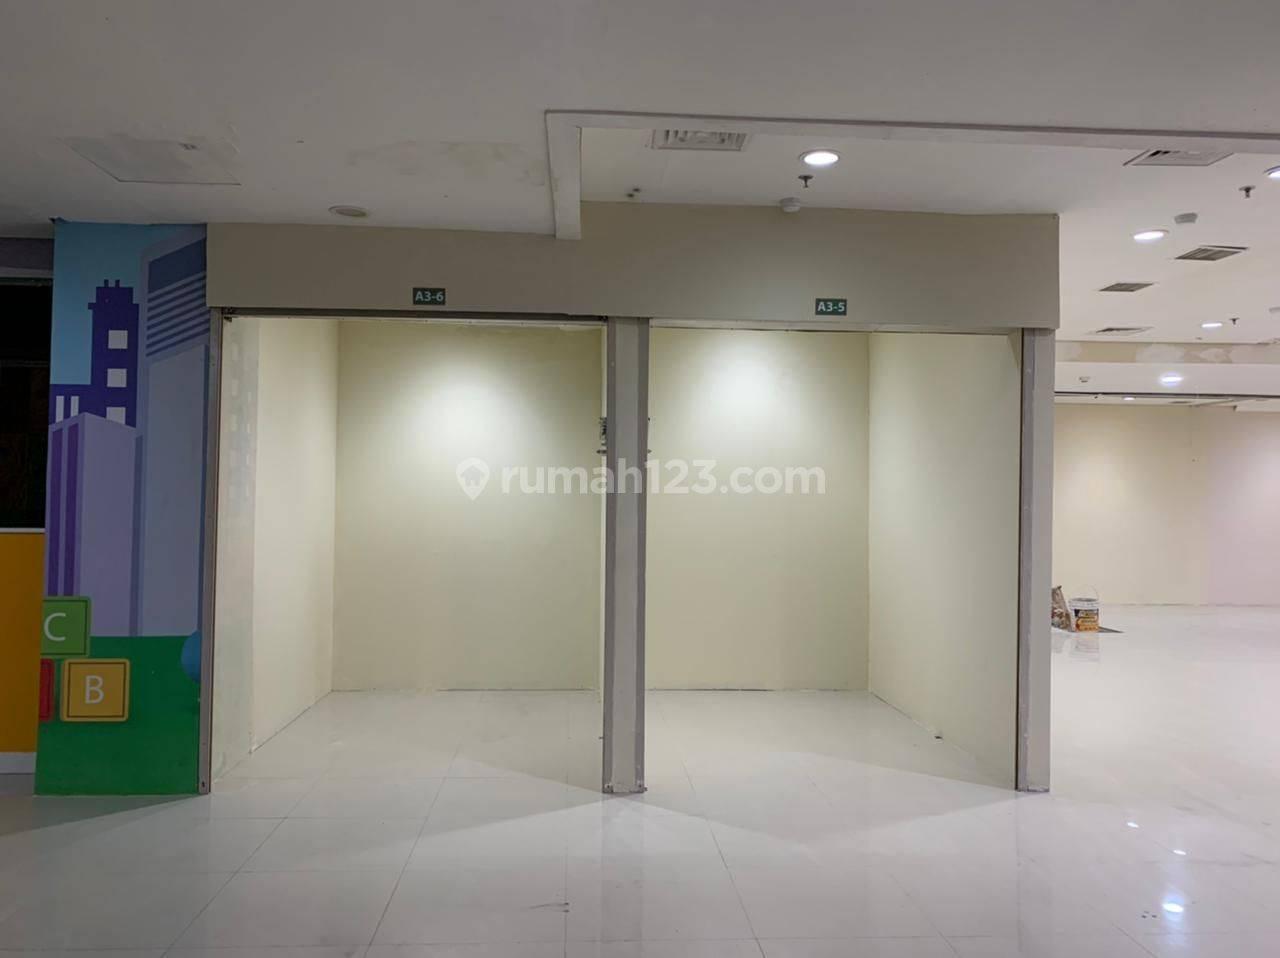 For Sale Kios @ Metro Cipulir mall - Kebayoran Lama, Jakarta Selatan